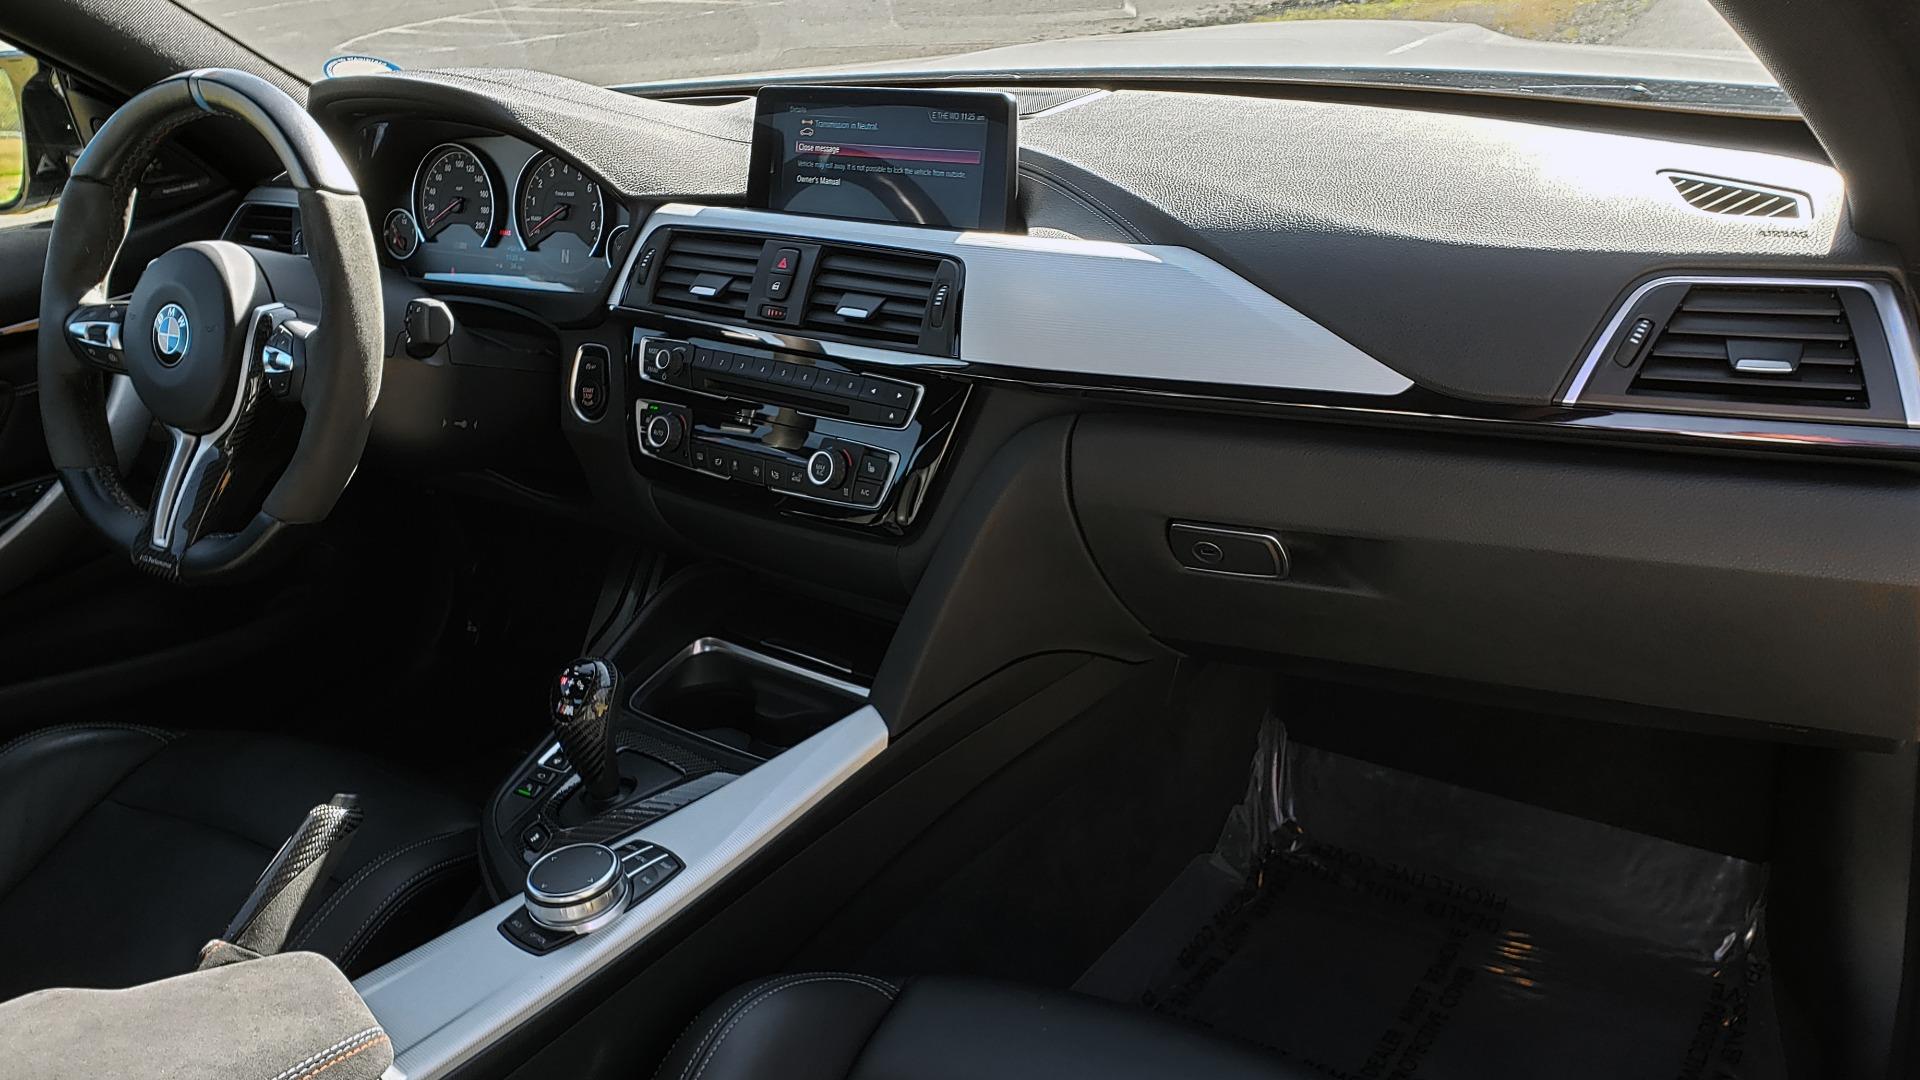 Used 2018 BMW M4 COMP PKG / EXEC / M-DRIVER / PARK CNTRL / ACTIVE BLIND SPOT for sale Sold at Formula Imports in Charlotte NC 28227 70